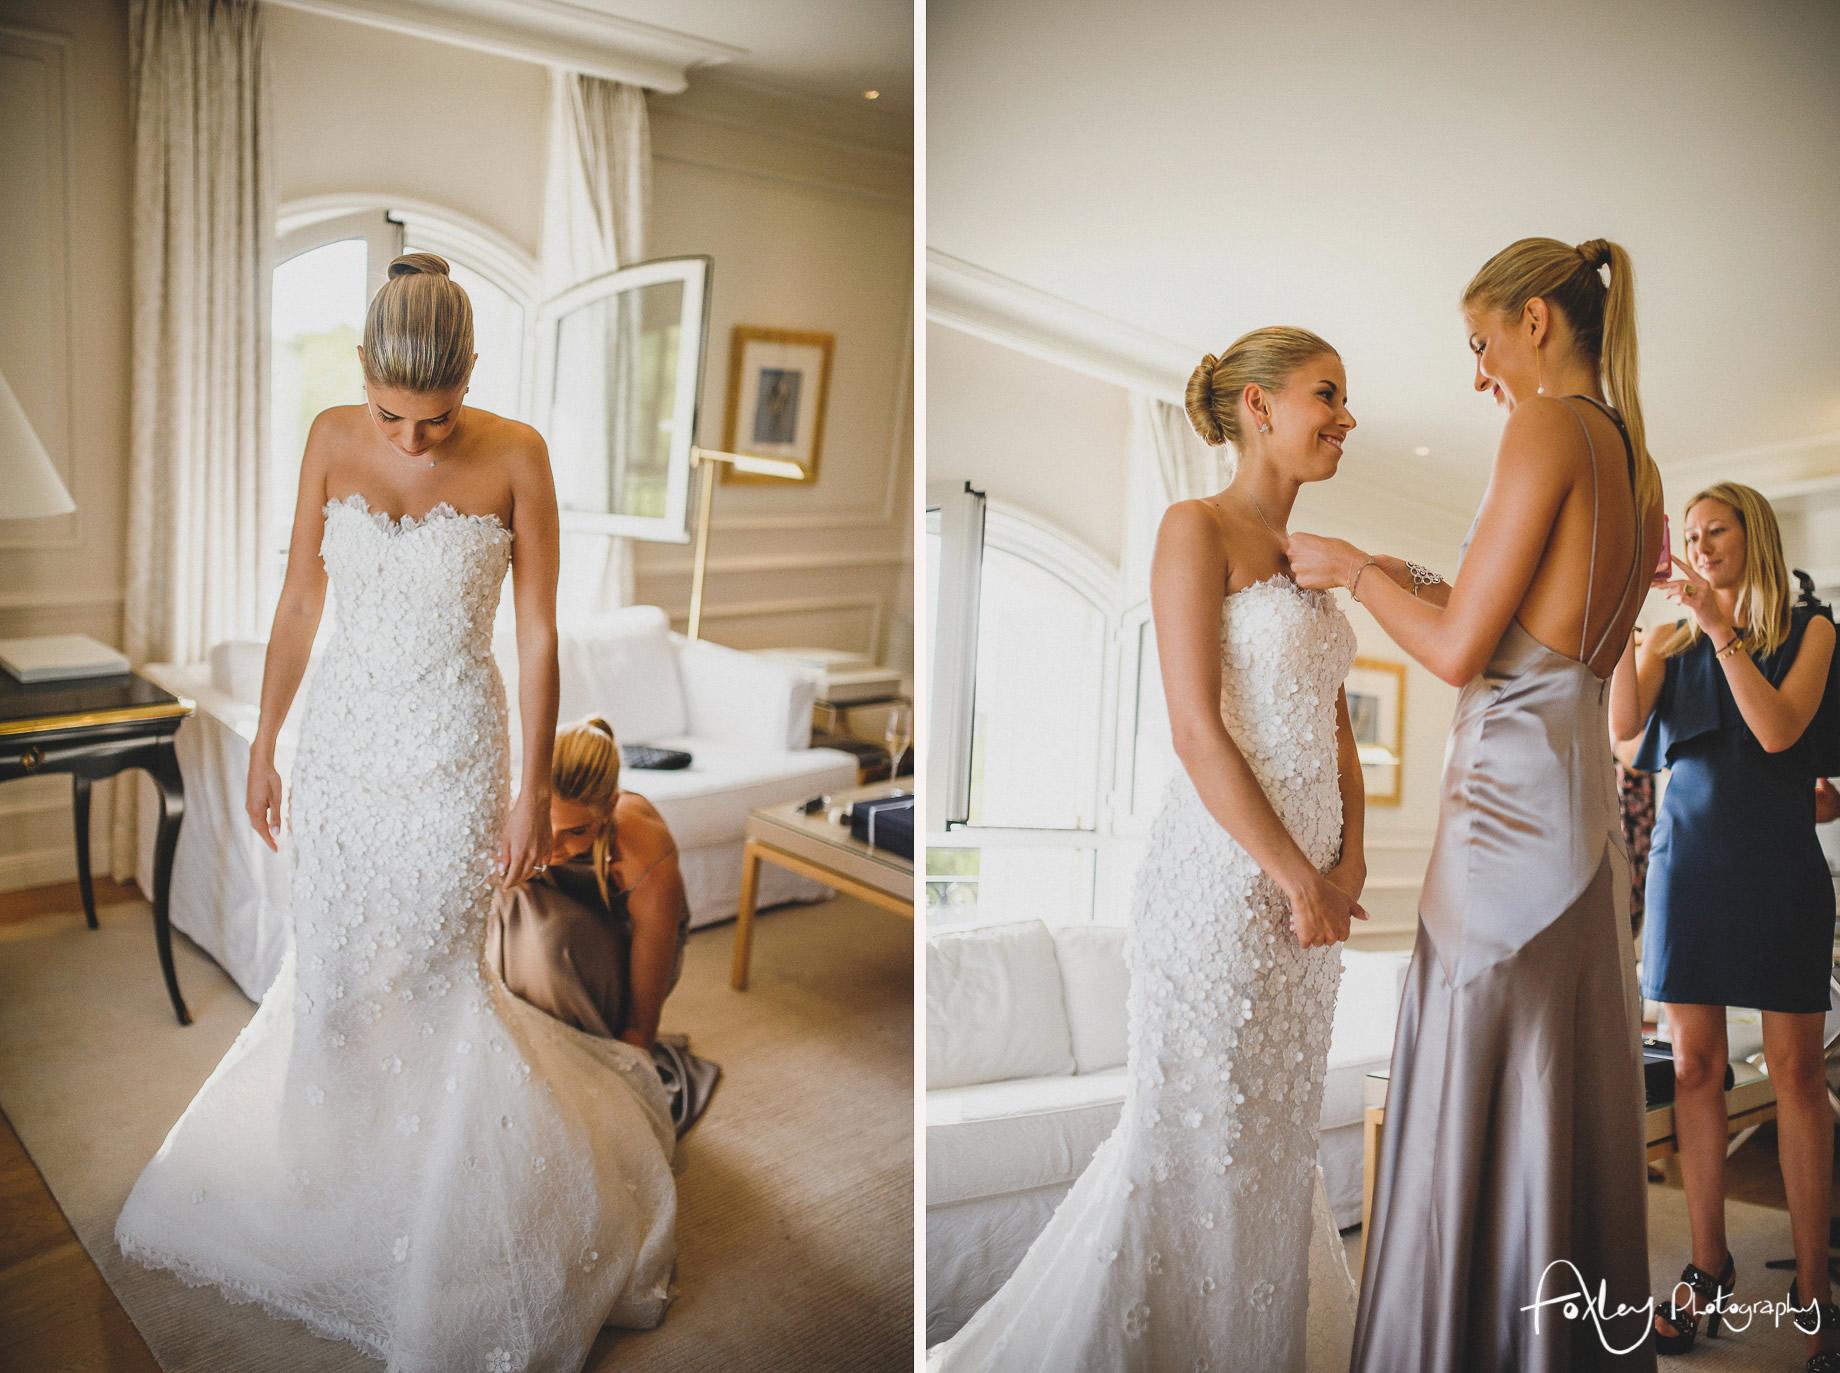 Jil and Will's Wedding at Villa Ephrussi De Rothschild 037